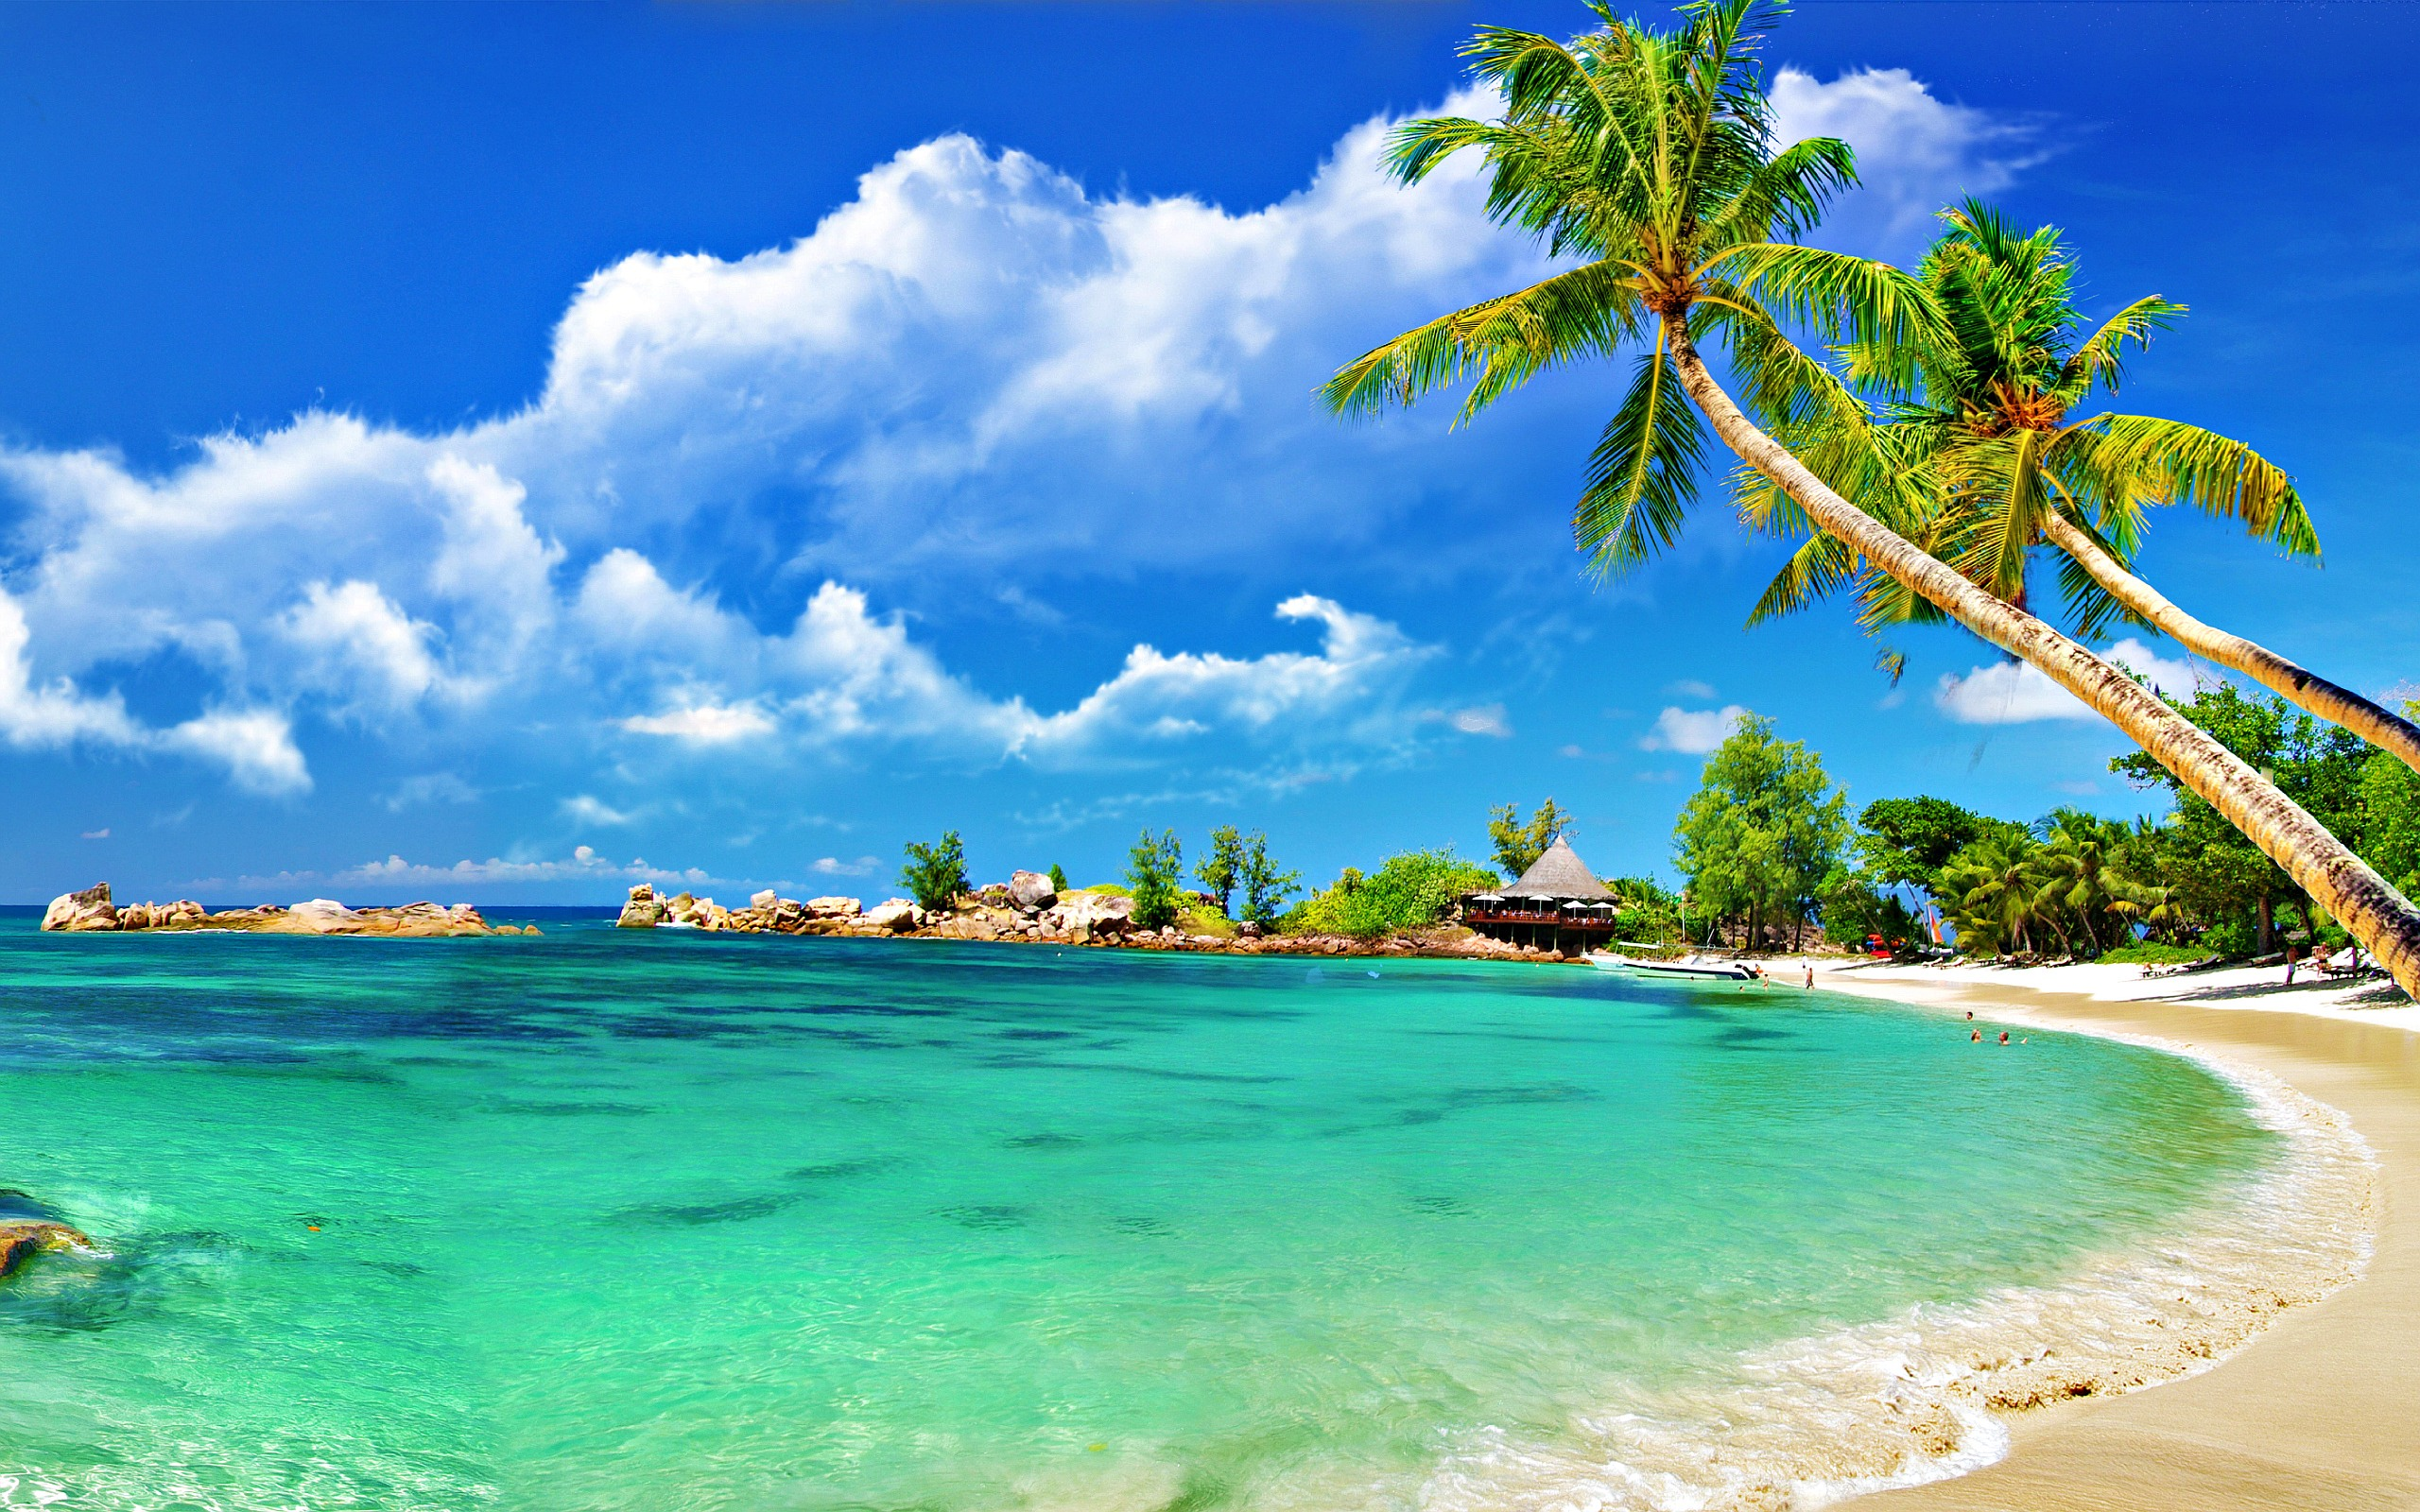 Hd wallpaper beach - Tropical Beach Wallpapers Wallpaper Tropical Beach Wallpapers Hd